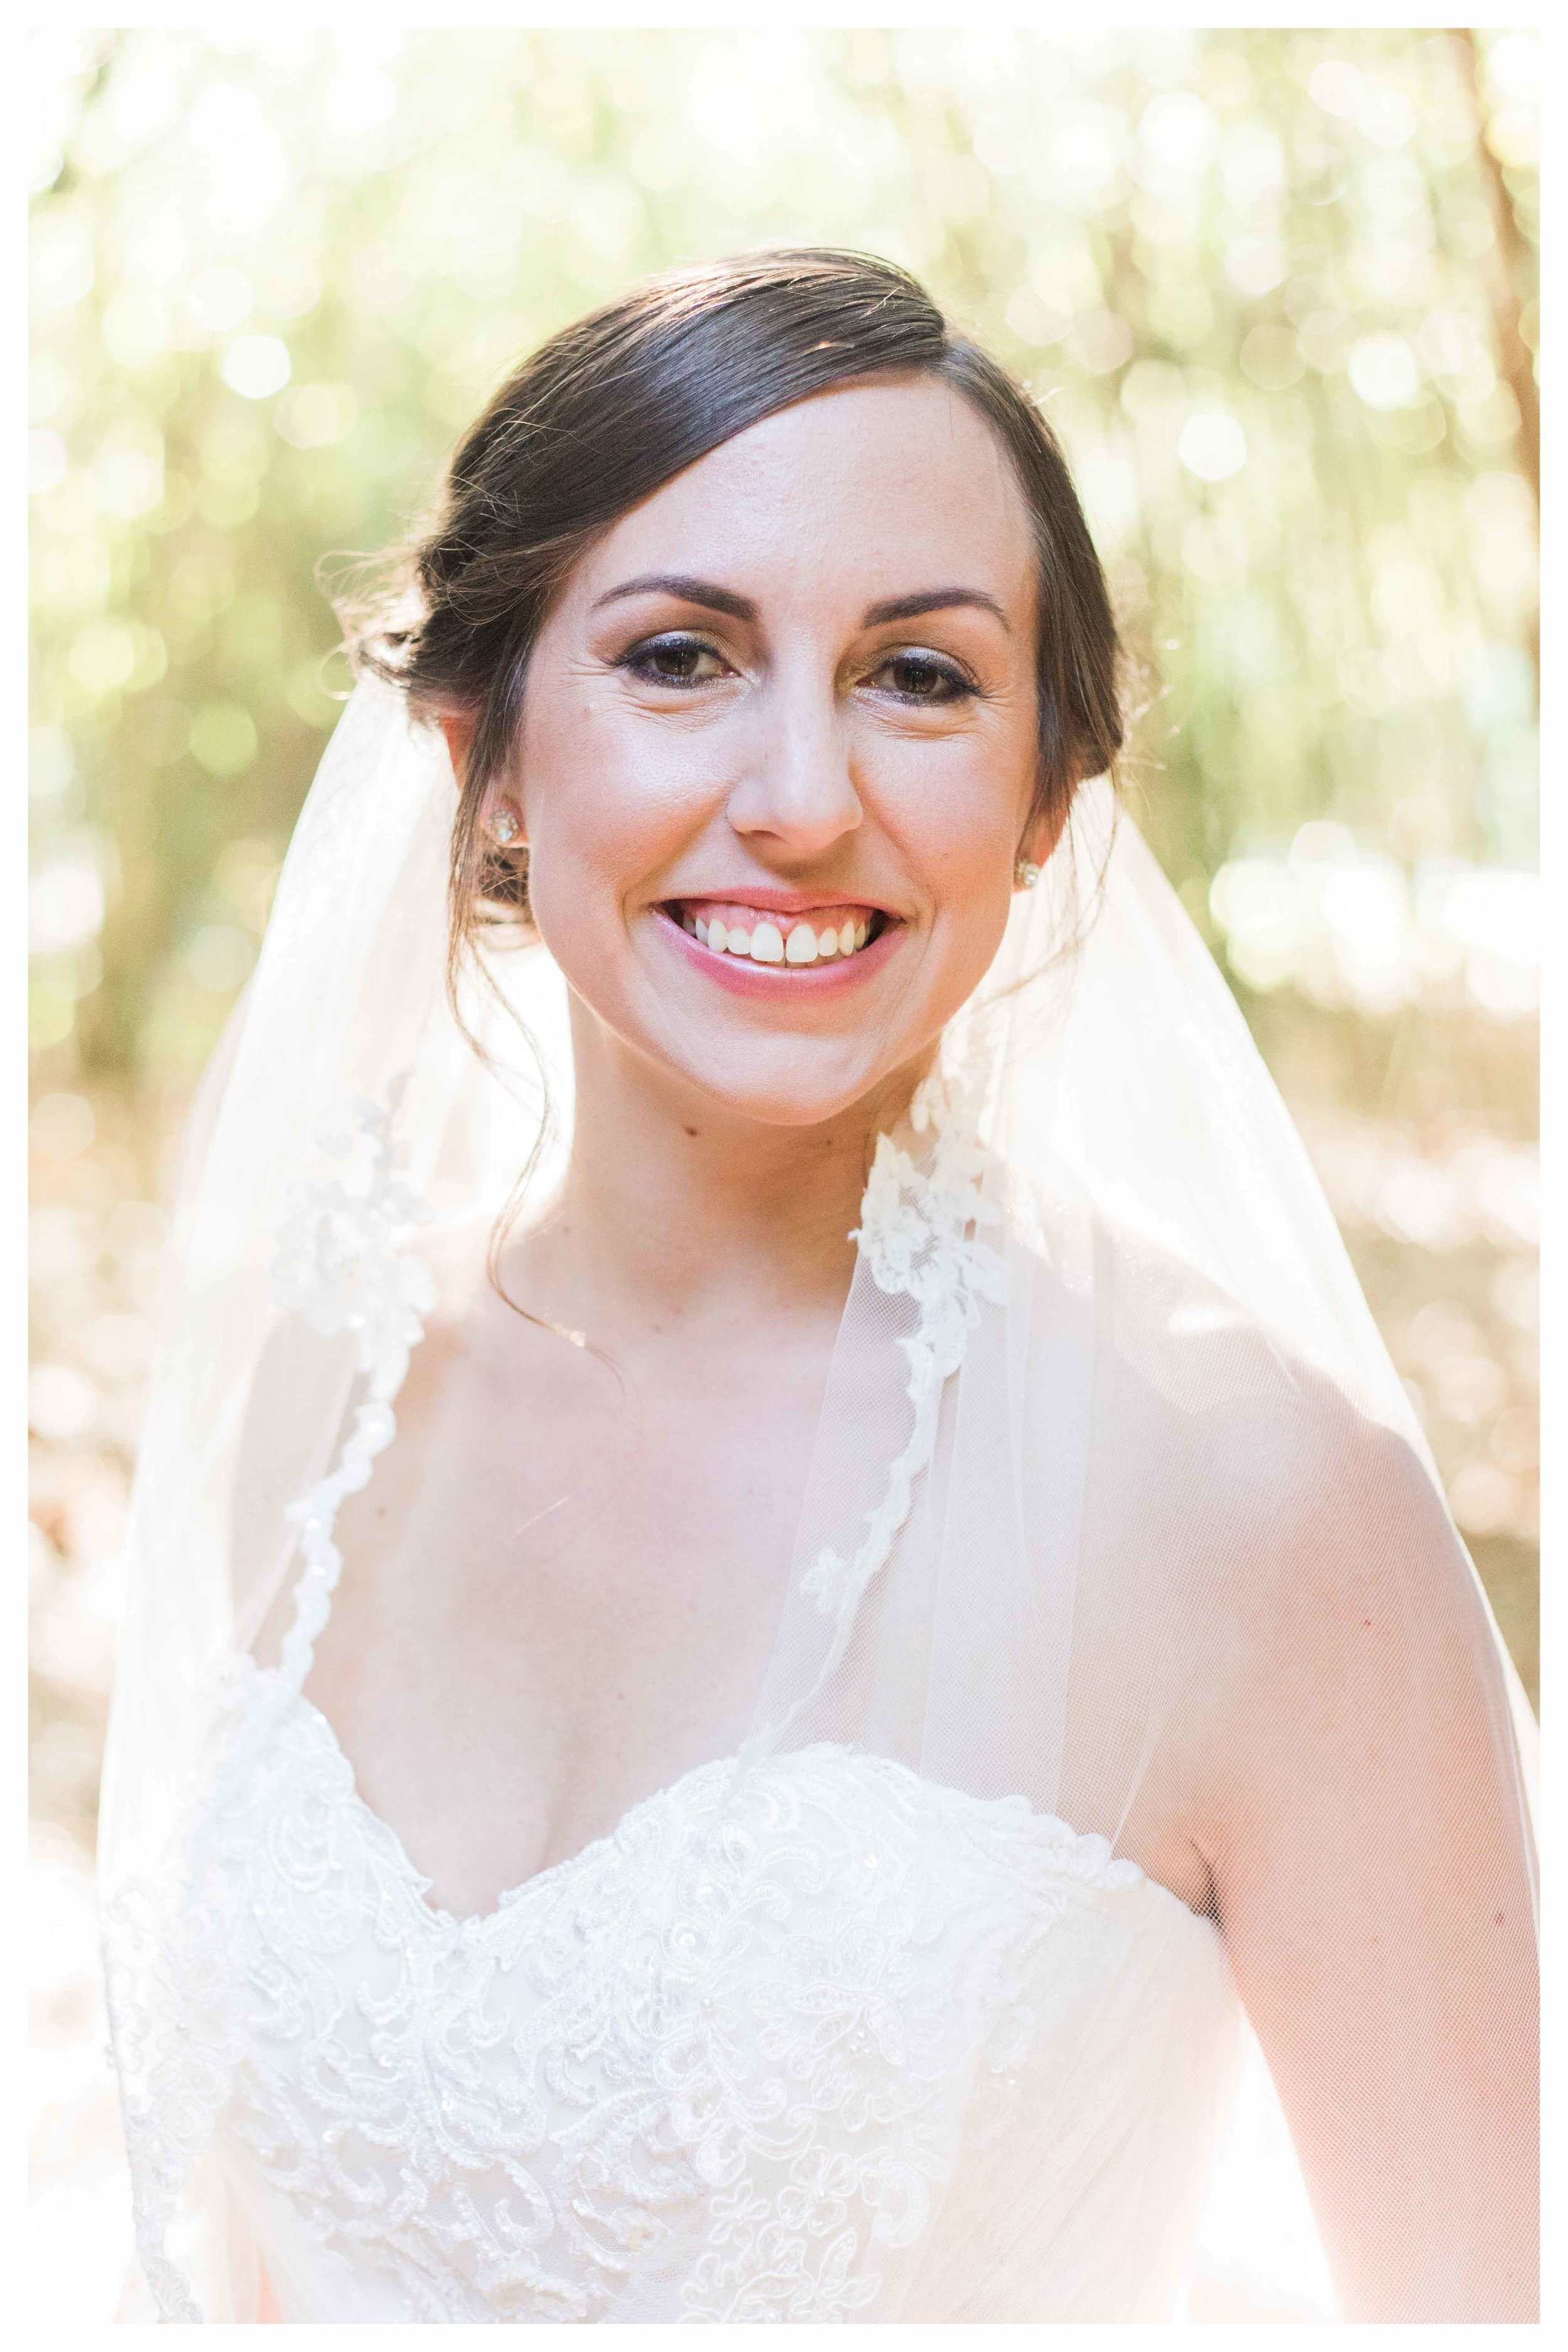 gunn_pre_wedding_first_look (200 of 231).jpg